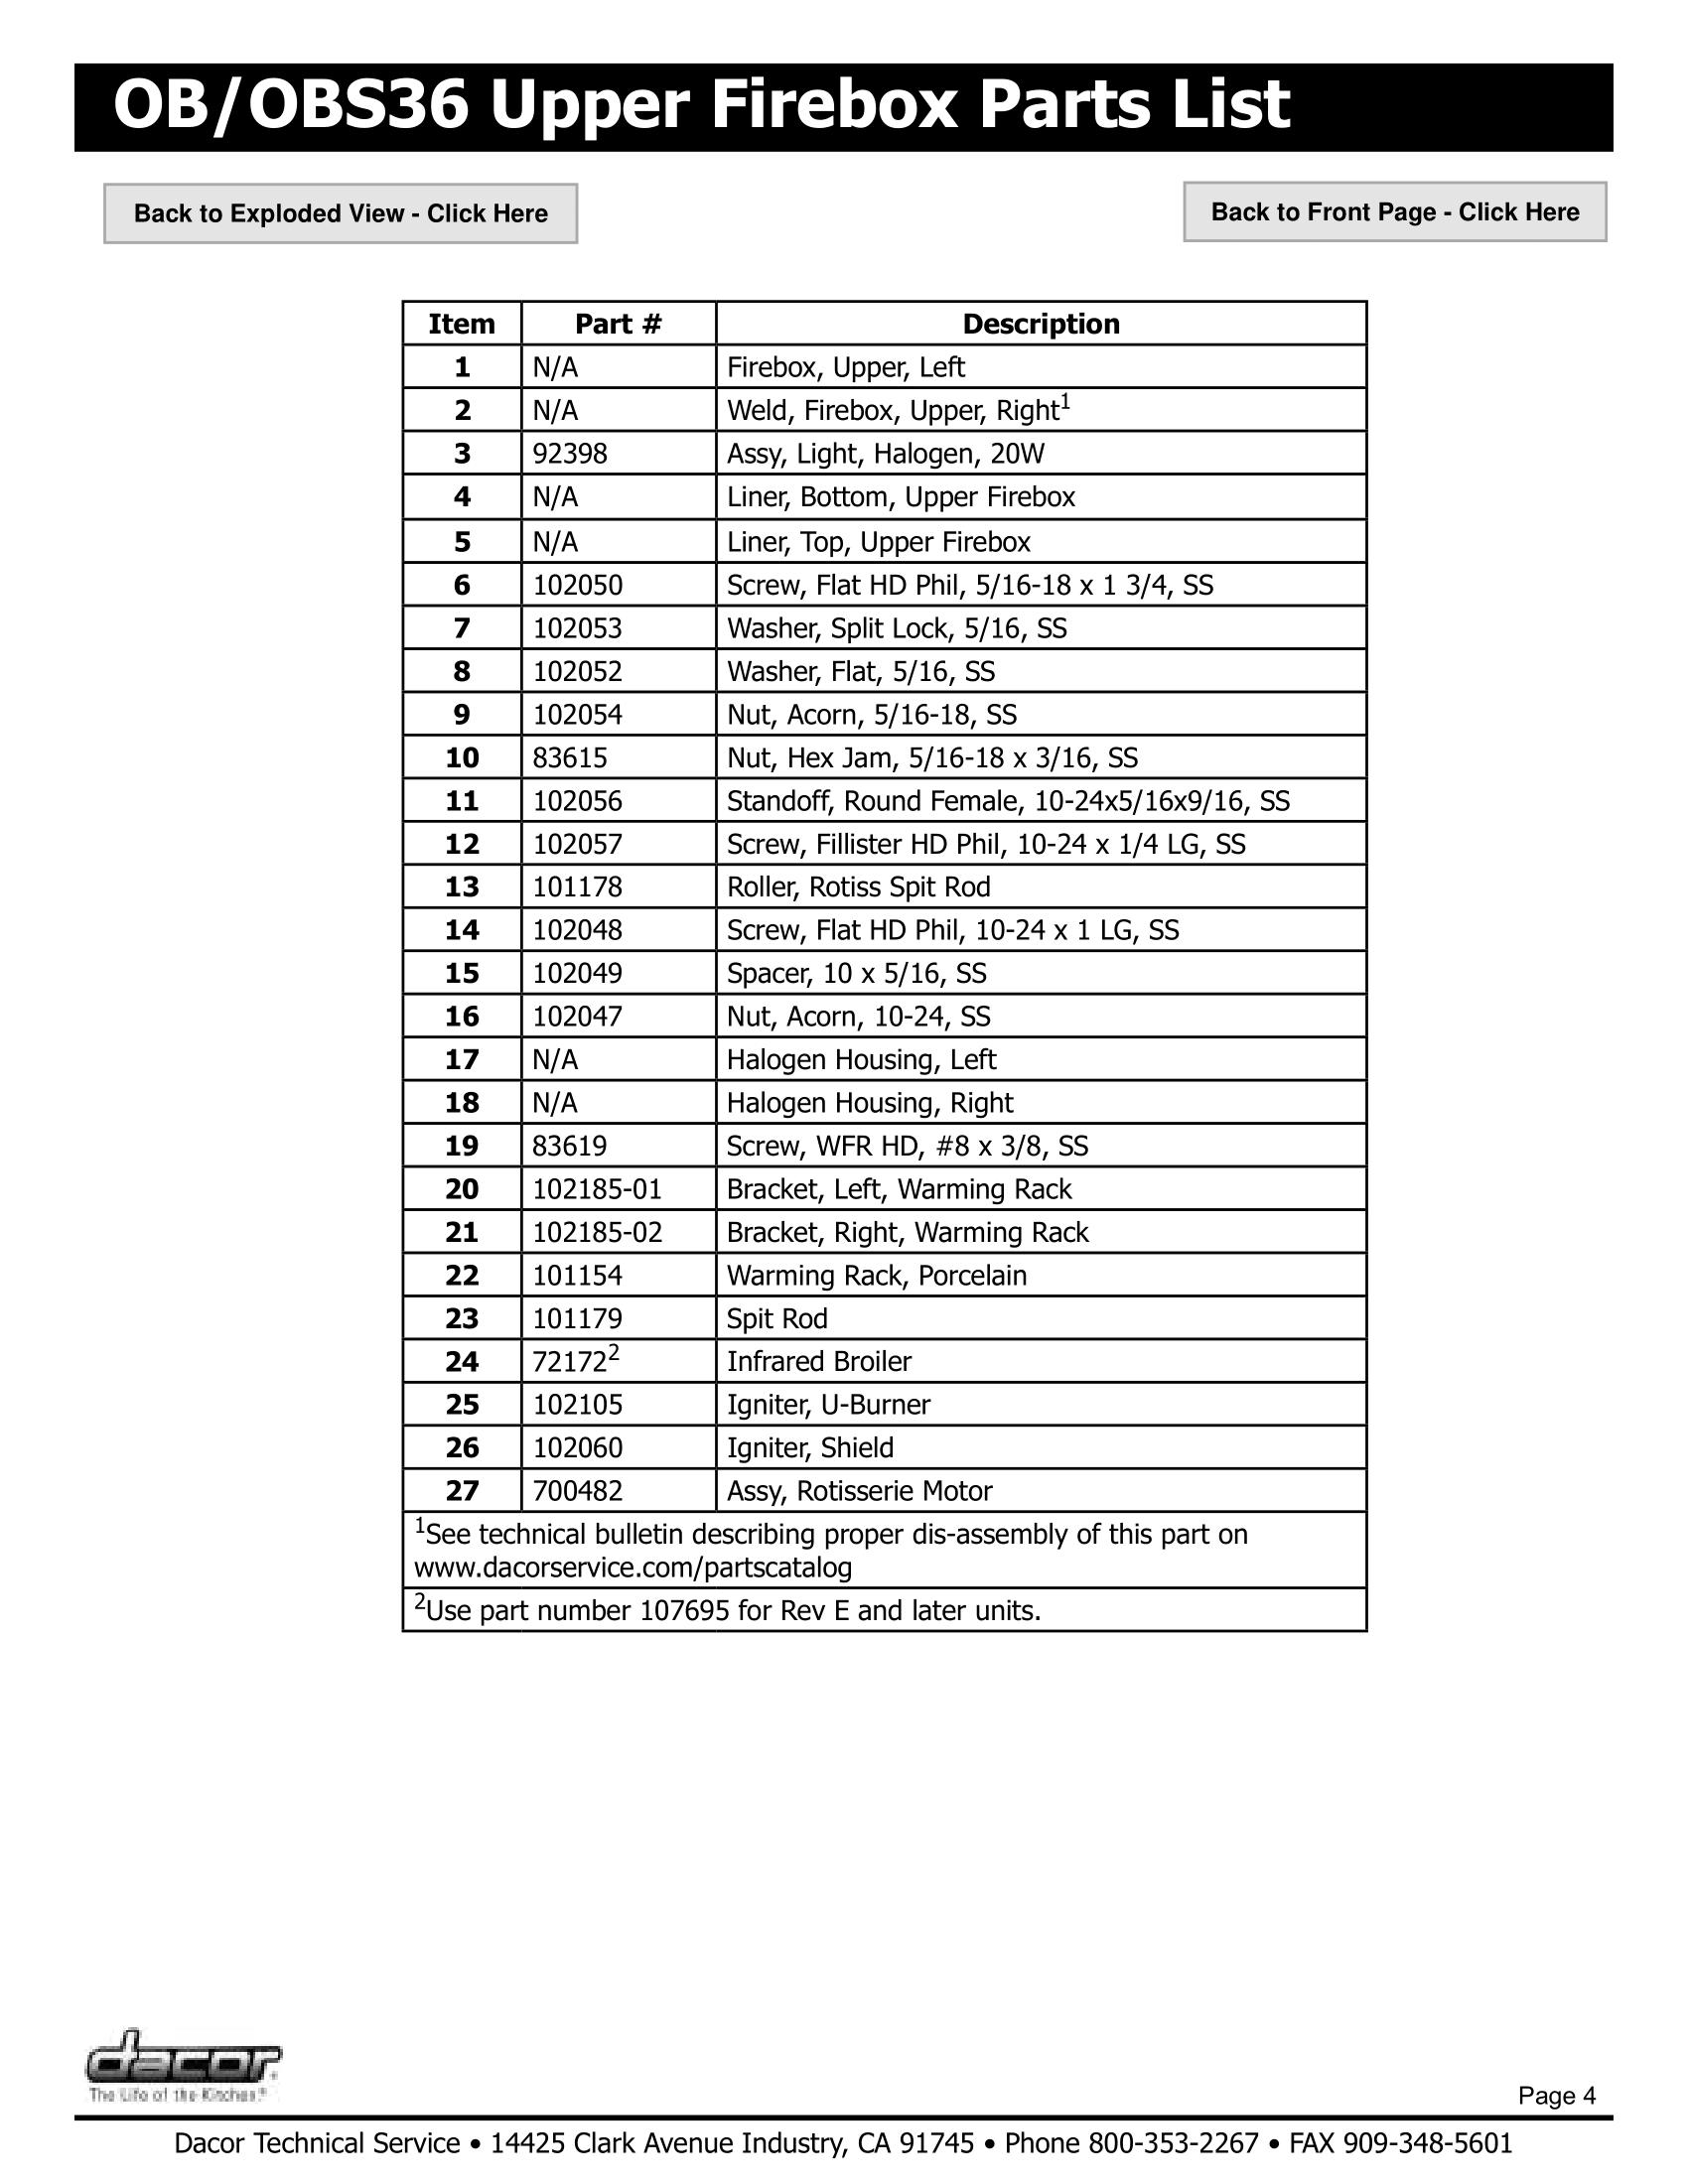 Dacor Dacor OBS36 Upper Firebox Assembly Parts List